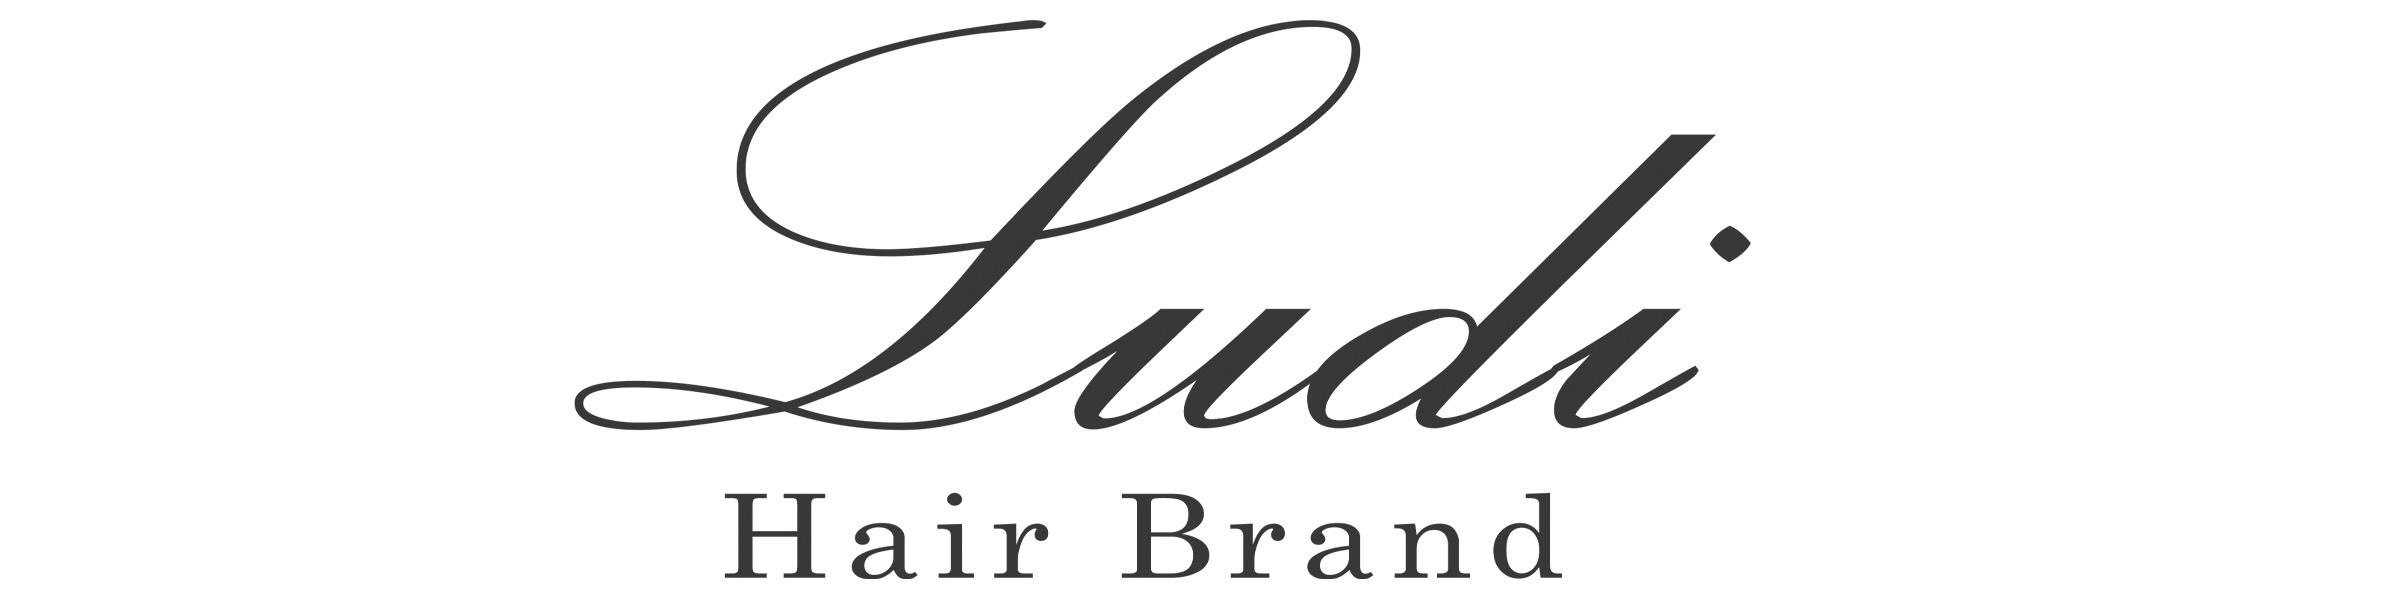 LUDI HAIR BRAND